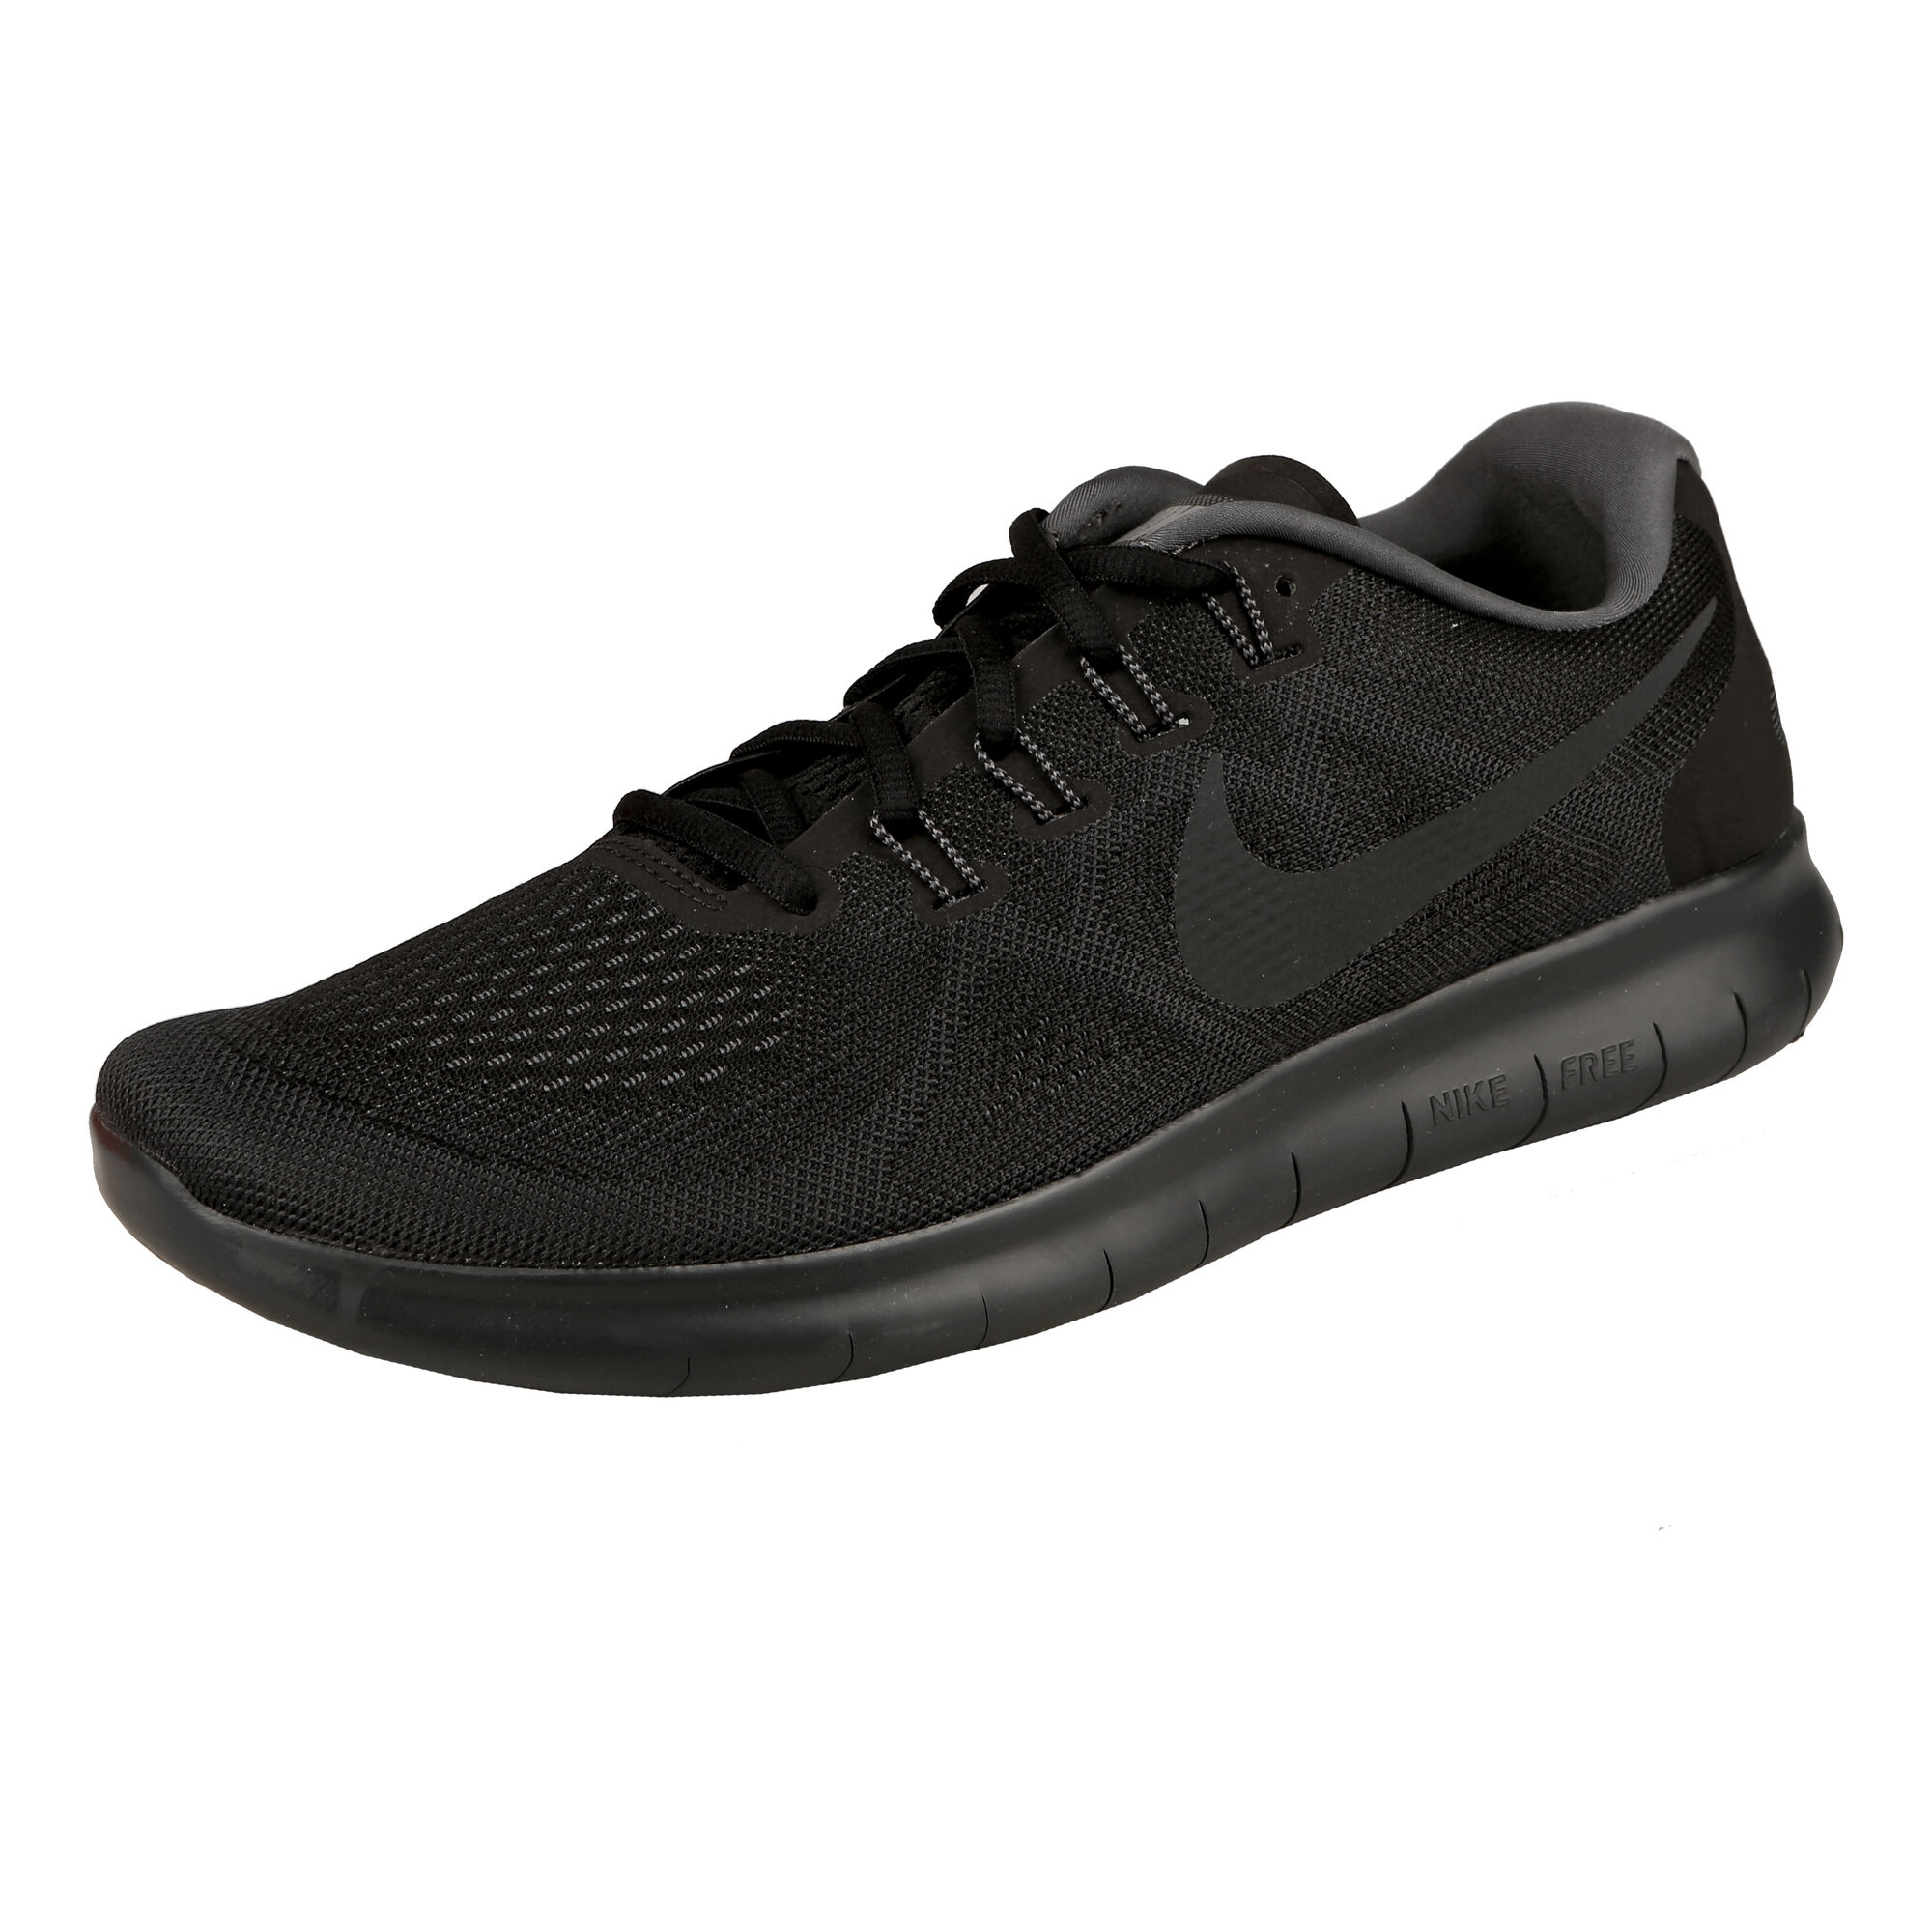 f97de5517200 buy Nike Free Run 2017 Natural Running Shoe Men - Black